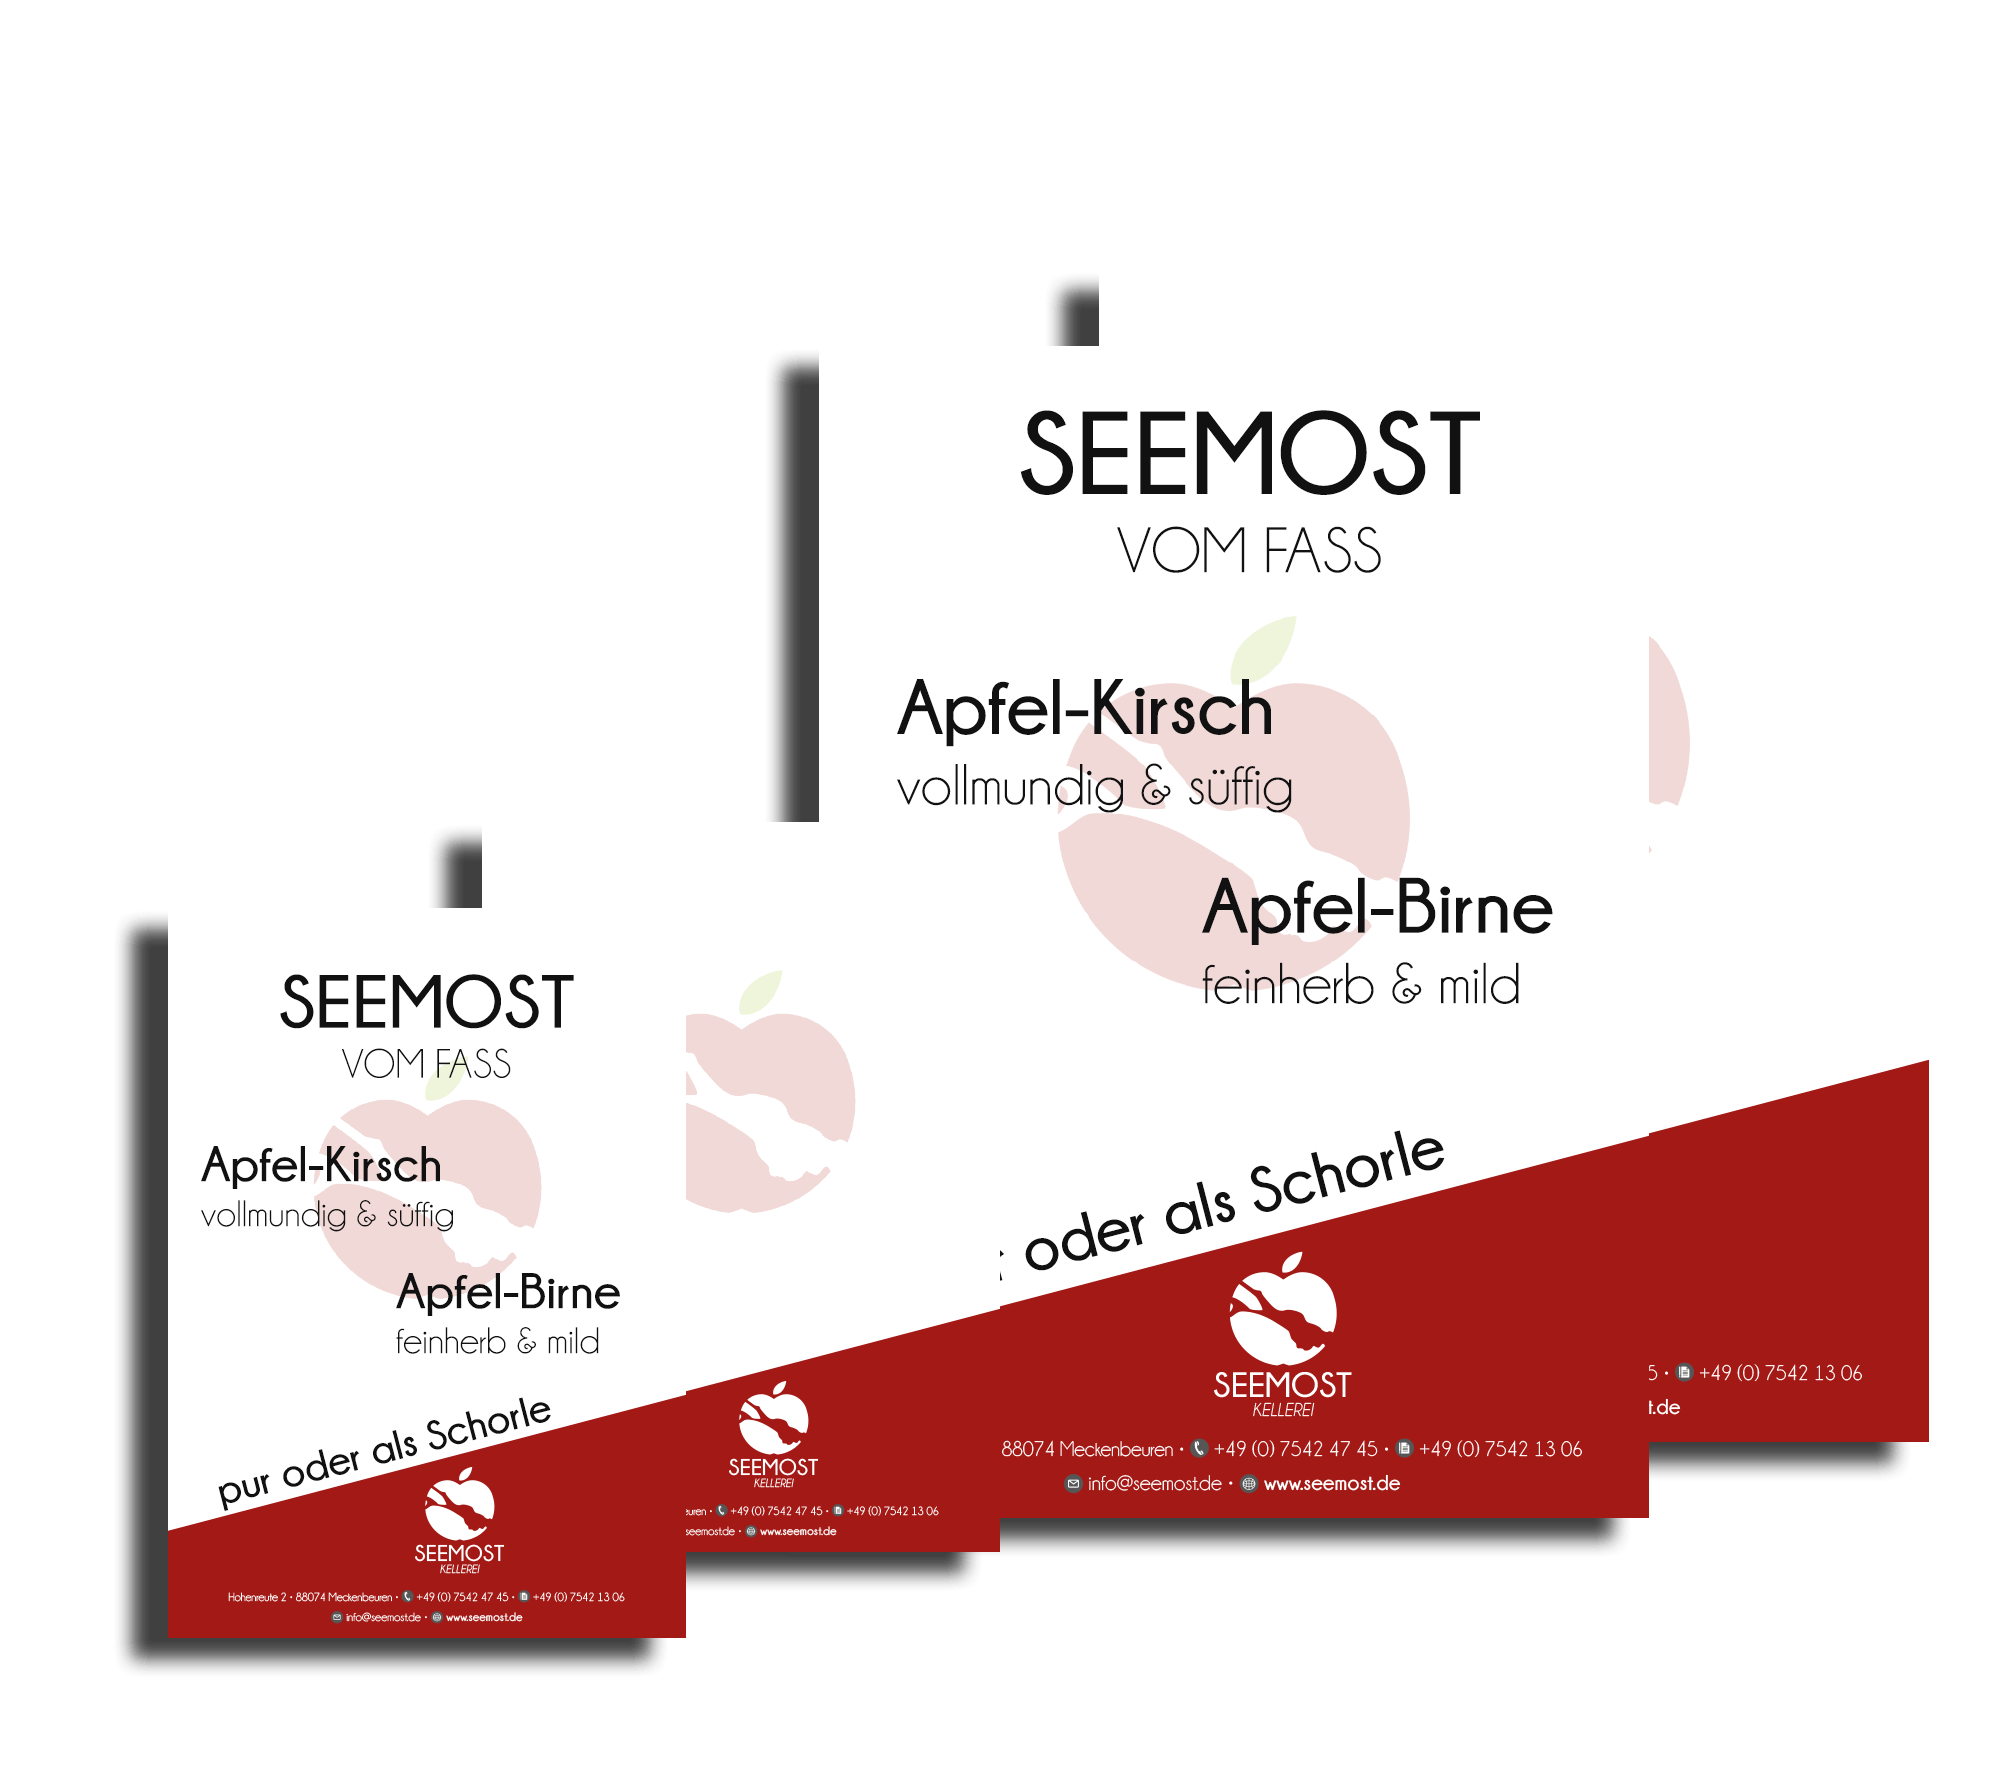 Seemost-Kellerei-Apfel-Gastronomie-Plakate